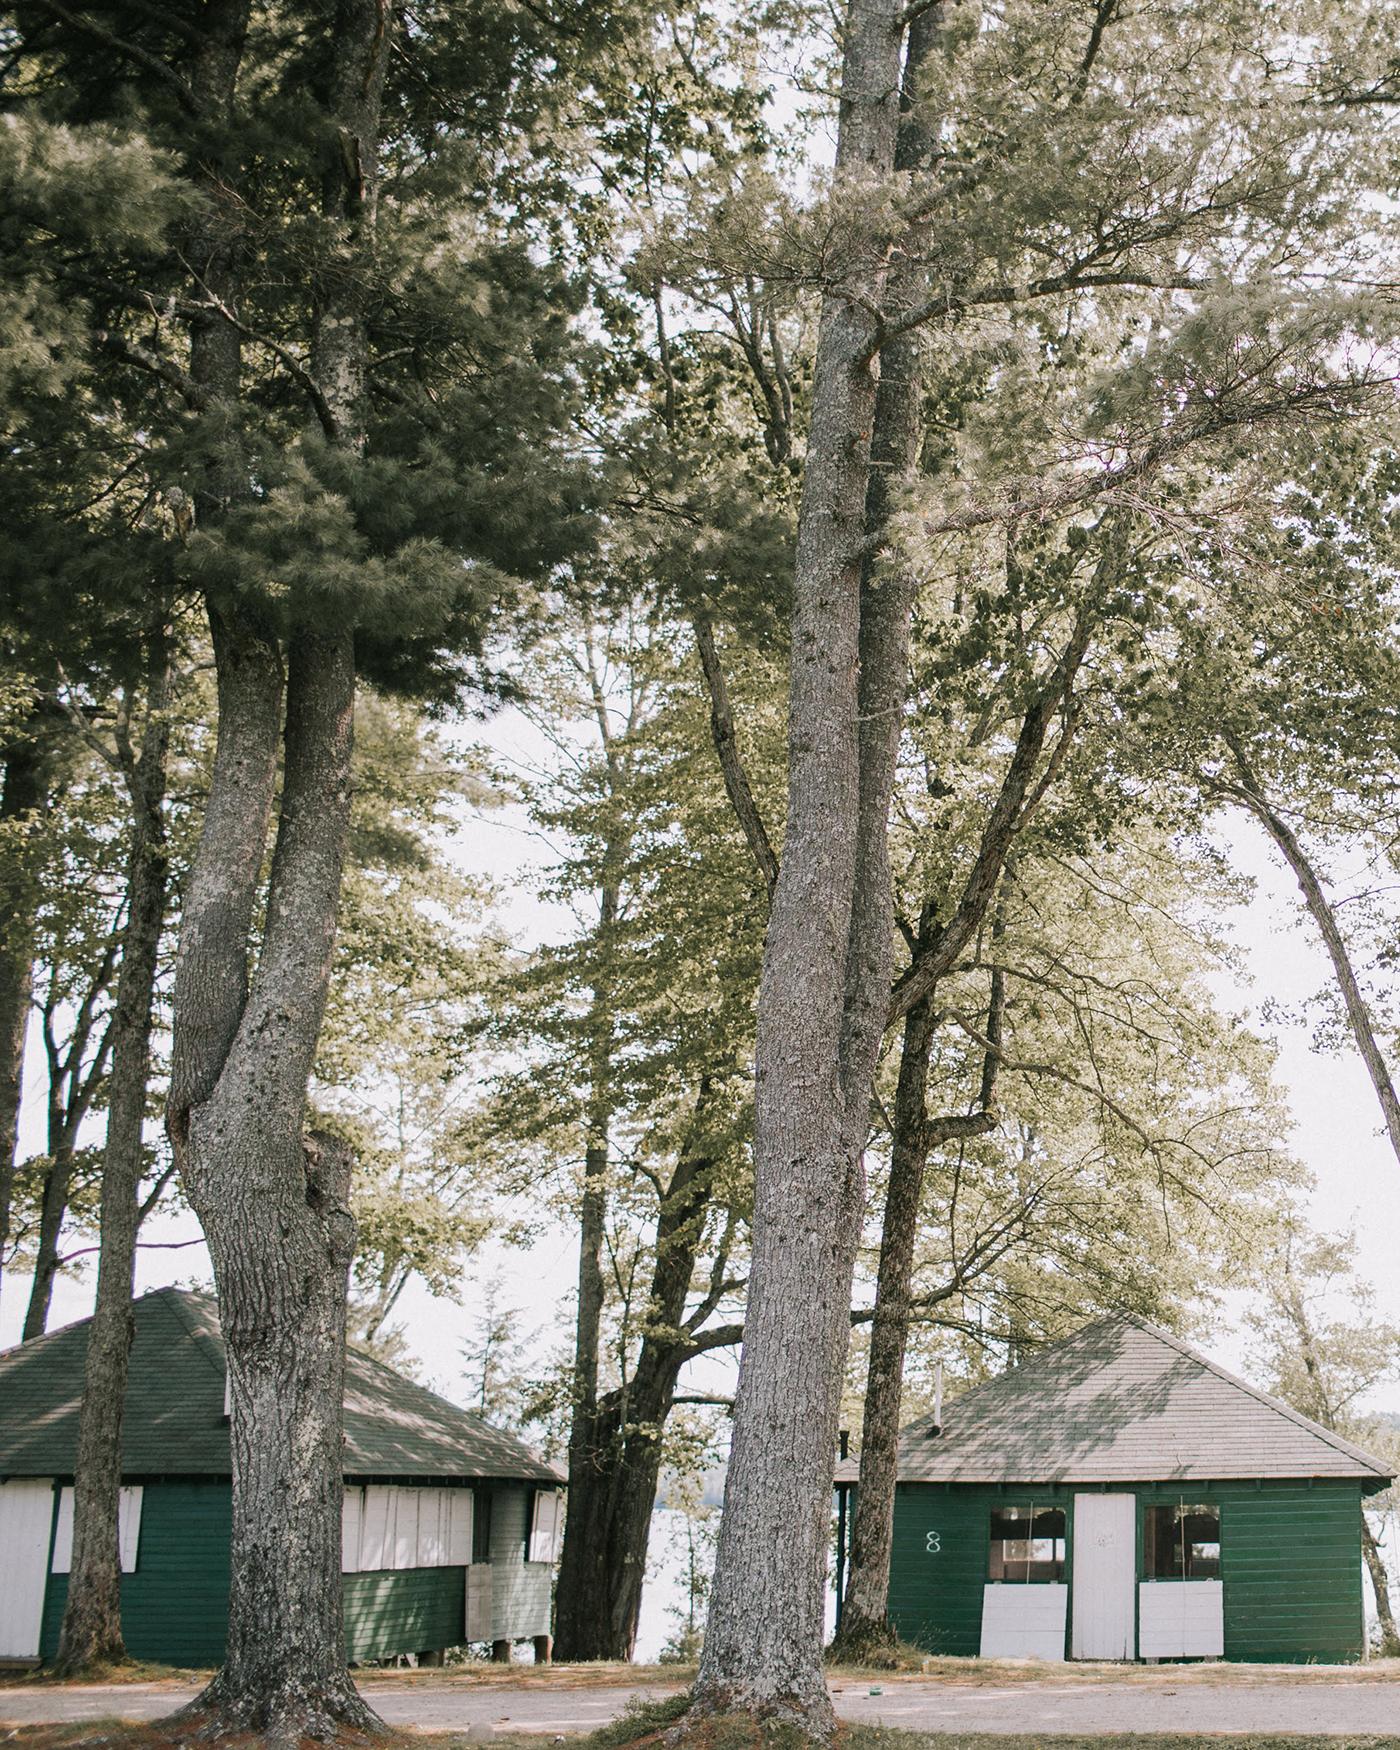 sofi ben camp weekend bunks among the trees